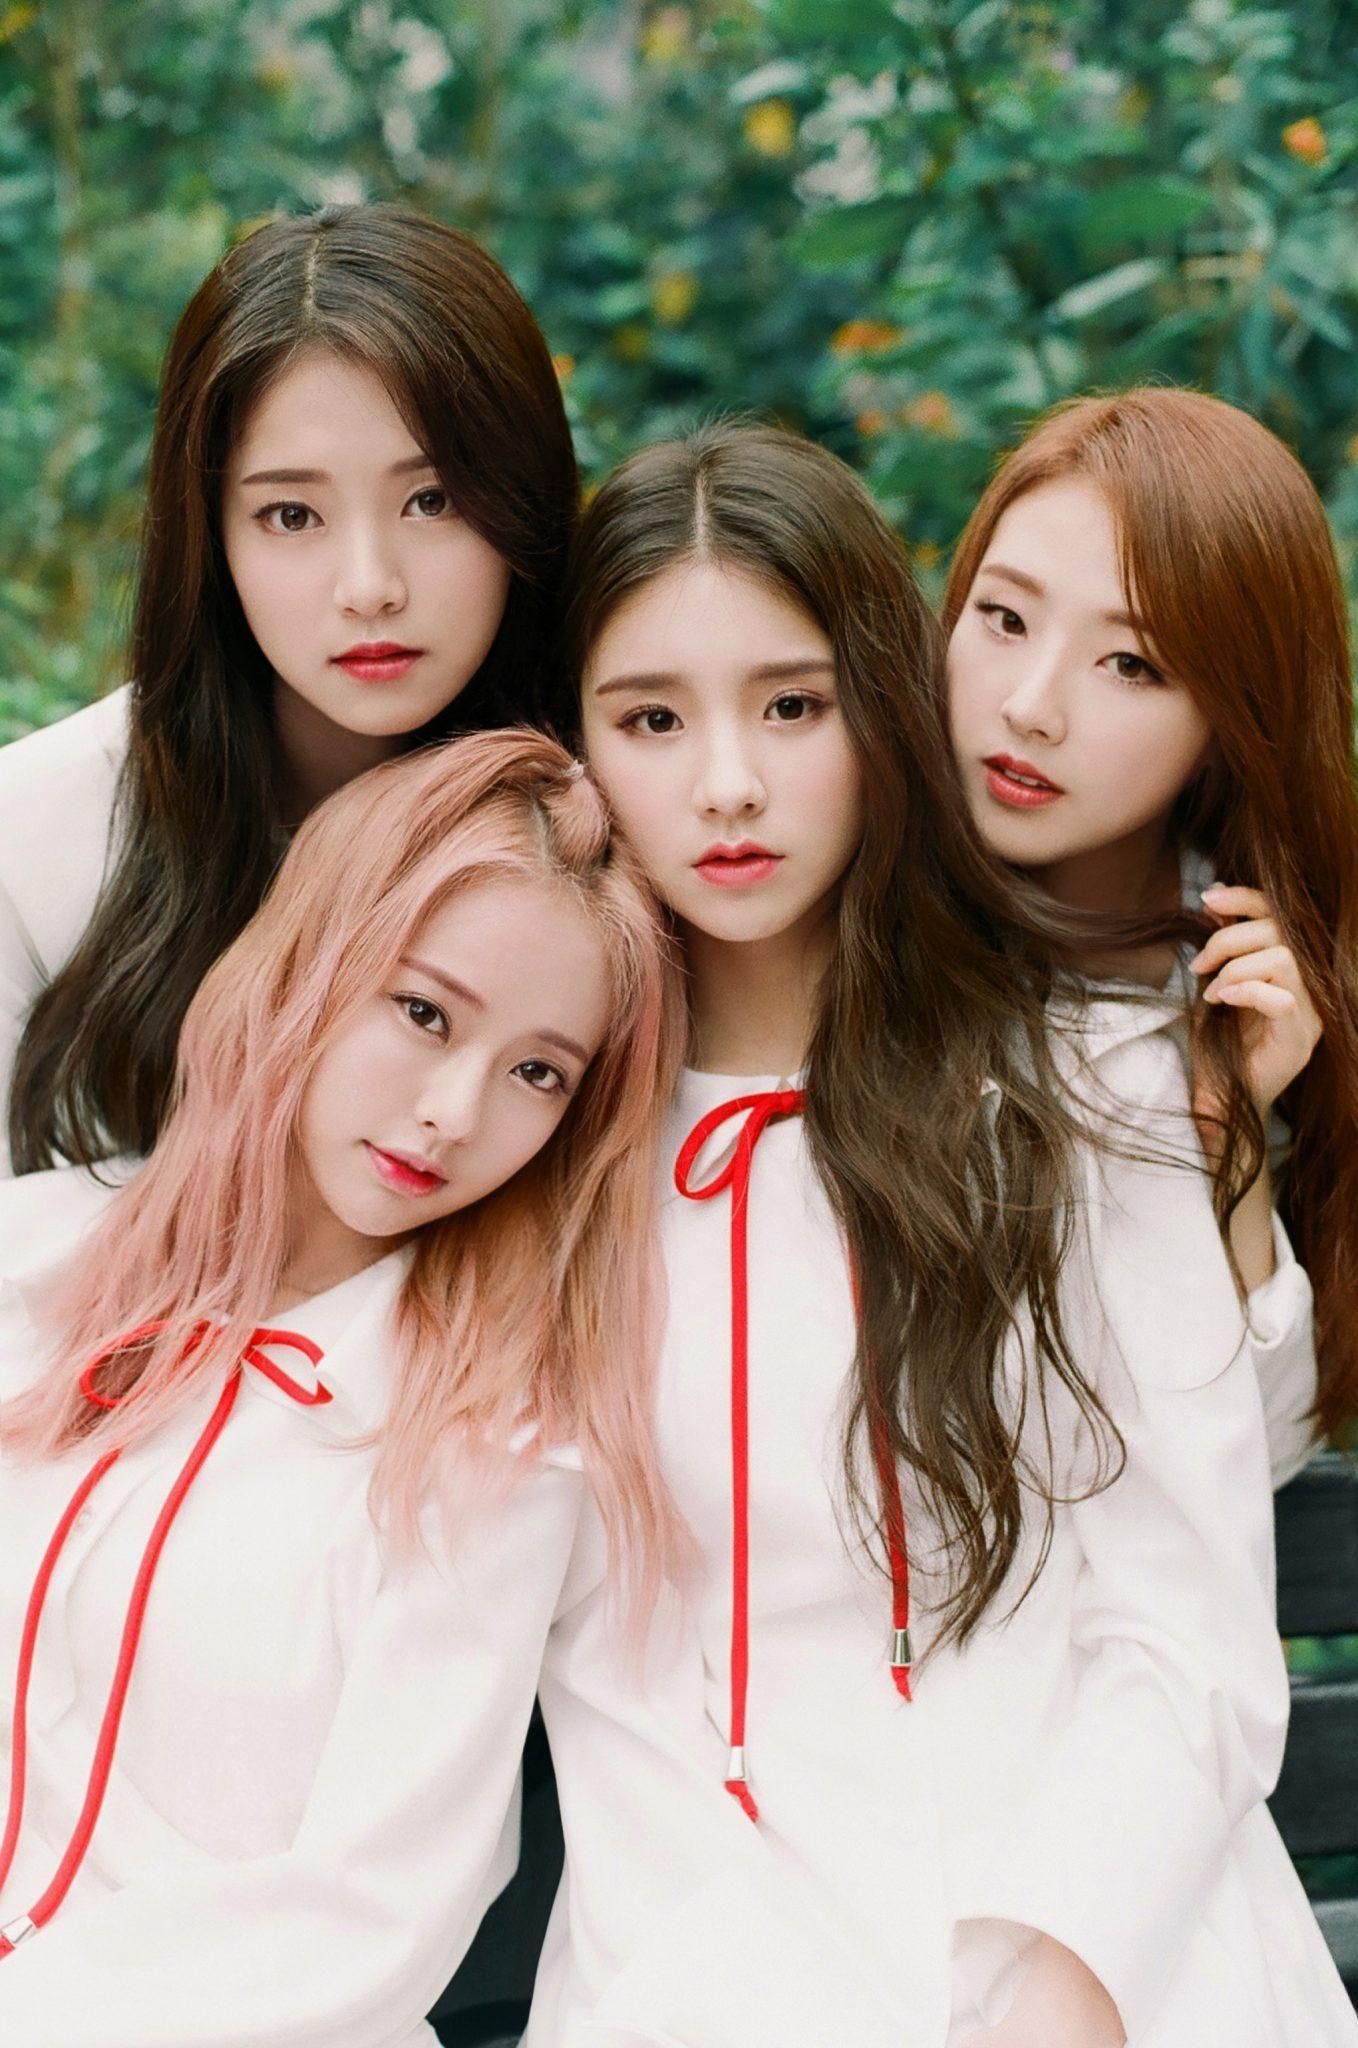 Loona S Newest Member Is The Next K Pop Visual Koreaboo Garotas Ideias Para Selfie Rosto Lindo